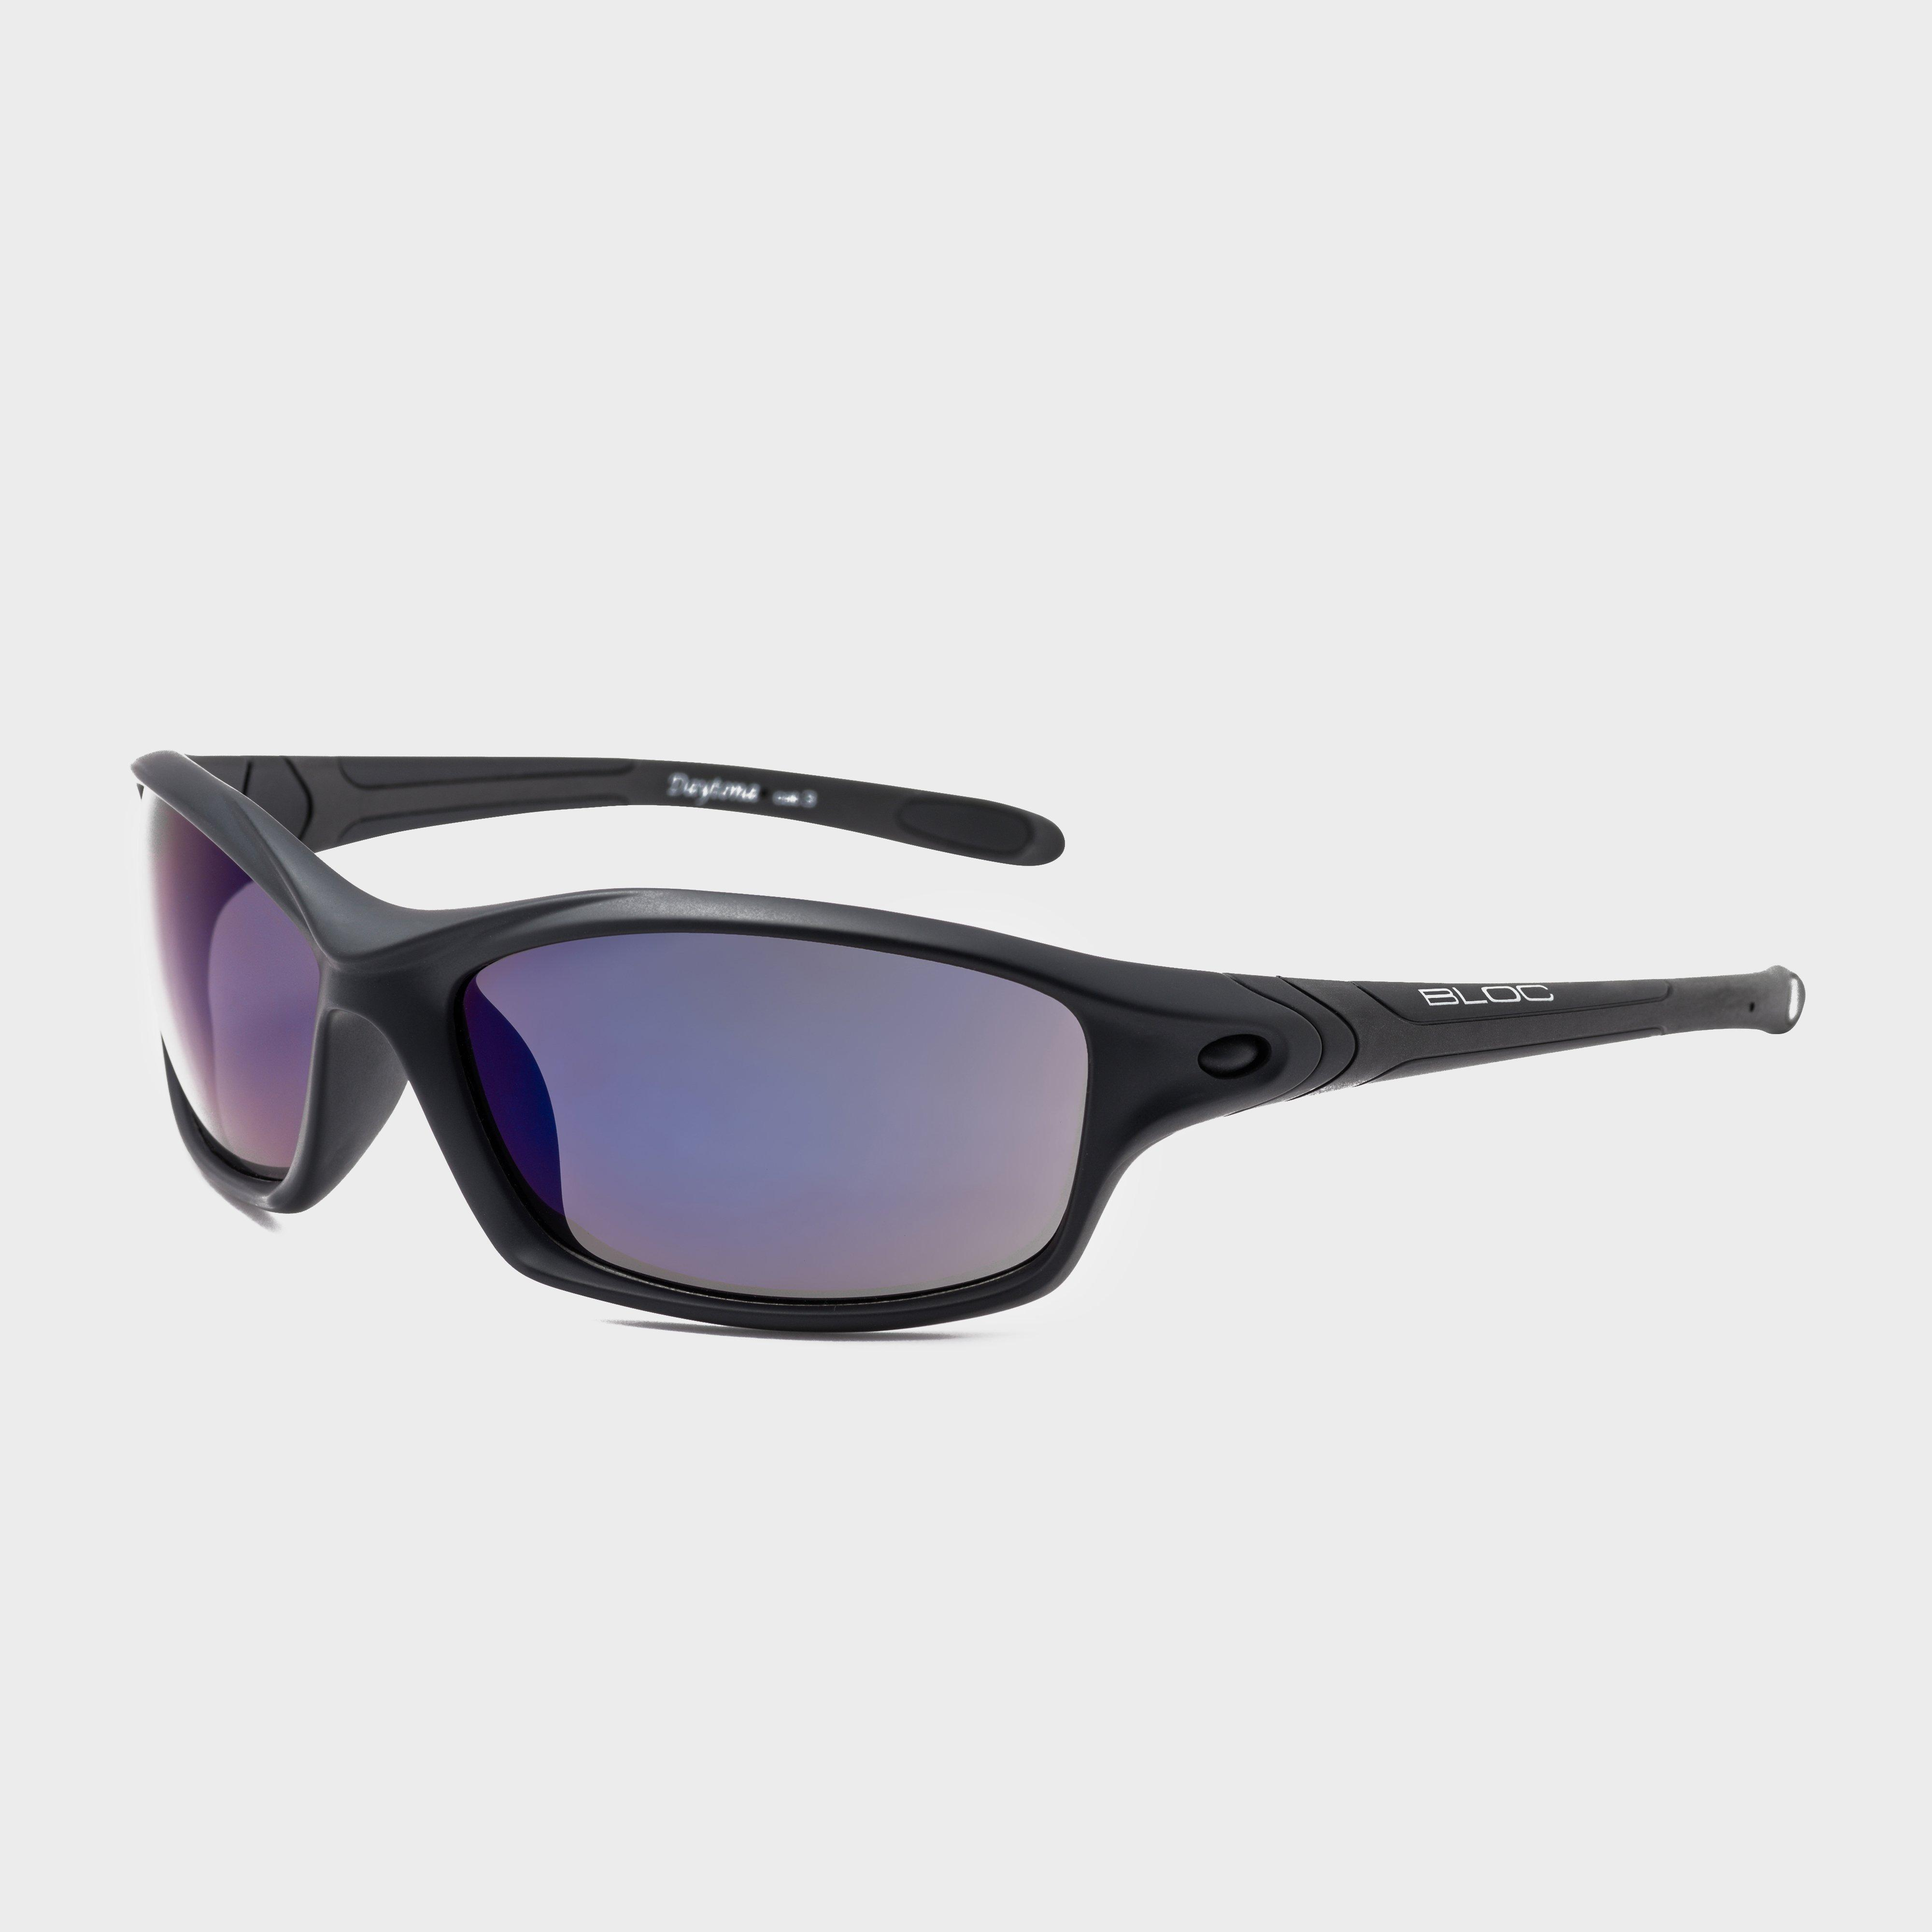 Bloc Daytona Xr60 Sunglasses - Black  Black